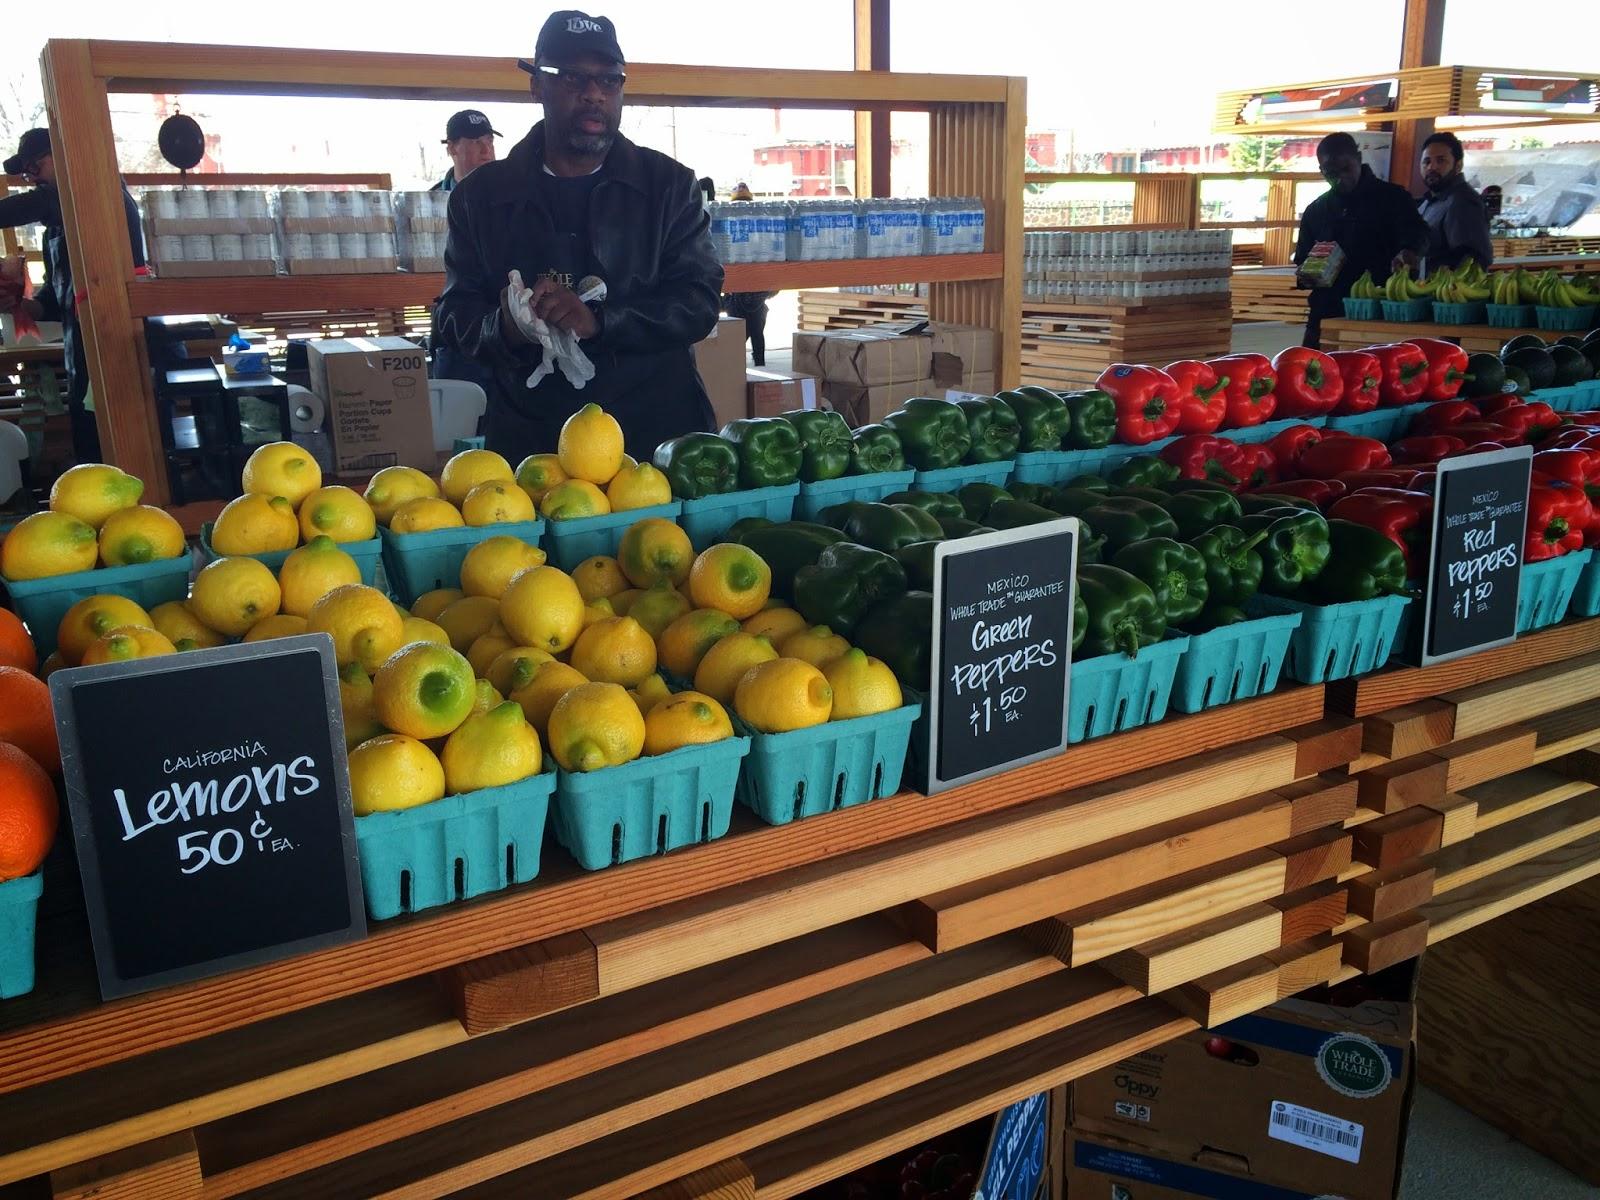 Whole Foods pop-up at Saint Elizabeths in Washington, DC